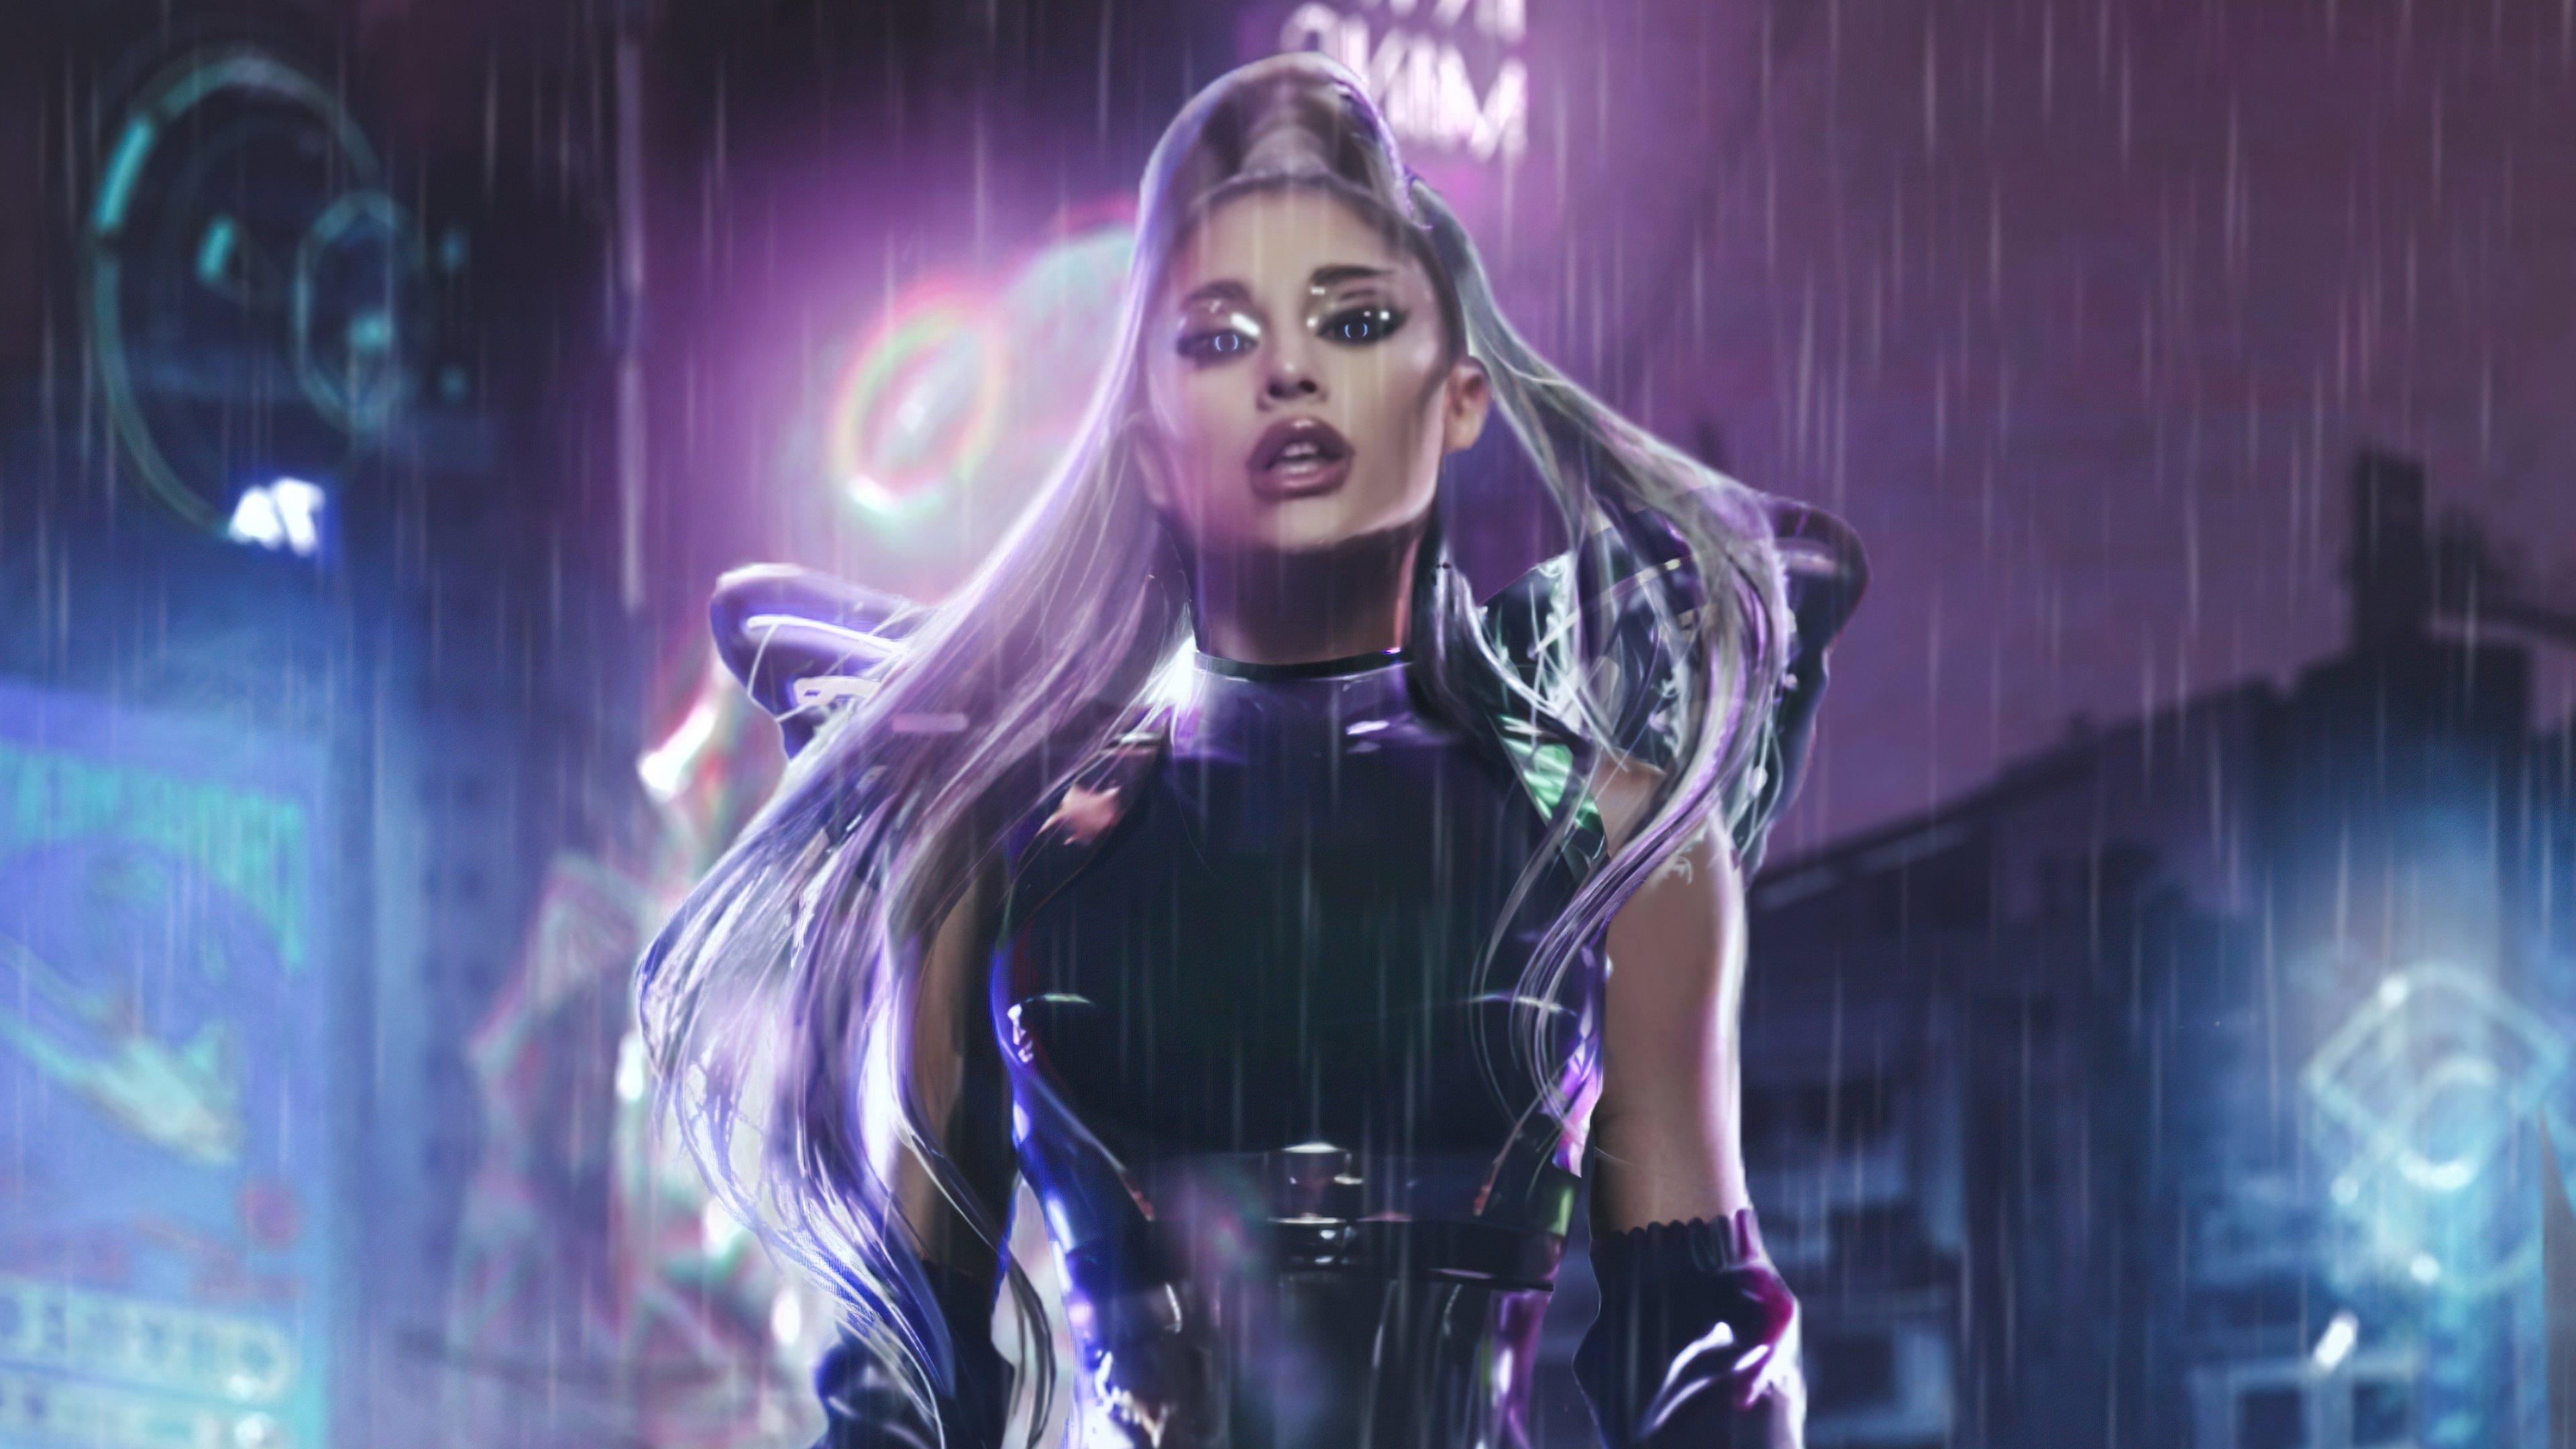 Wallpaper Ariana Grande Rain on me